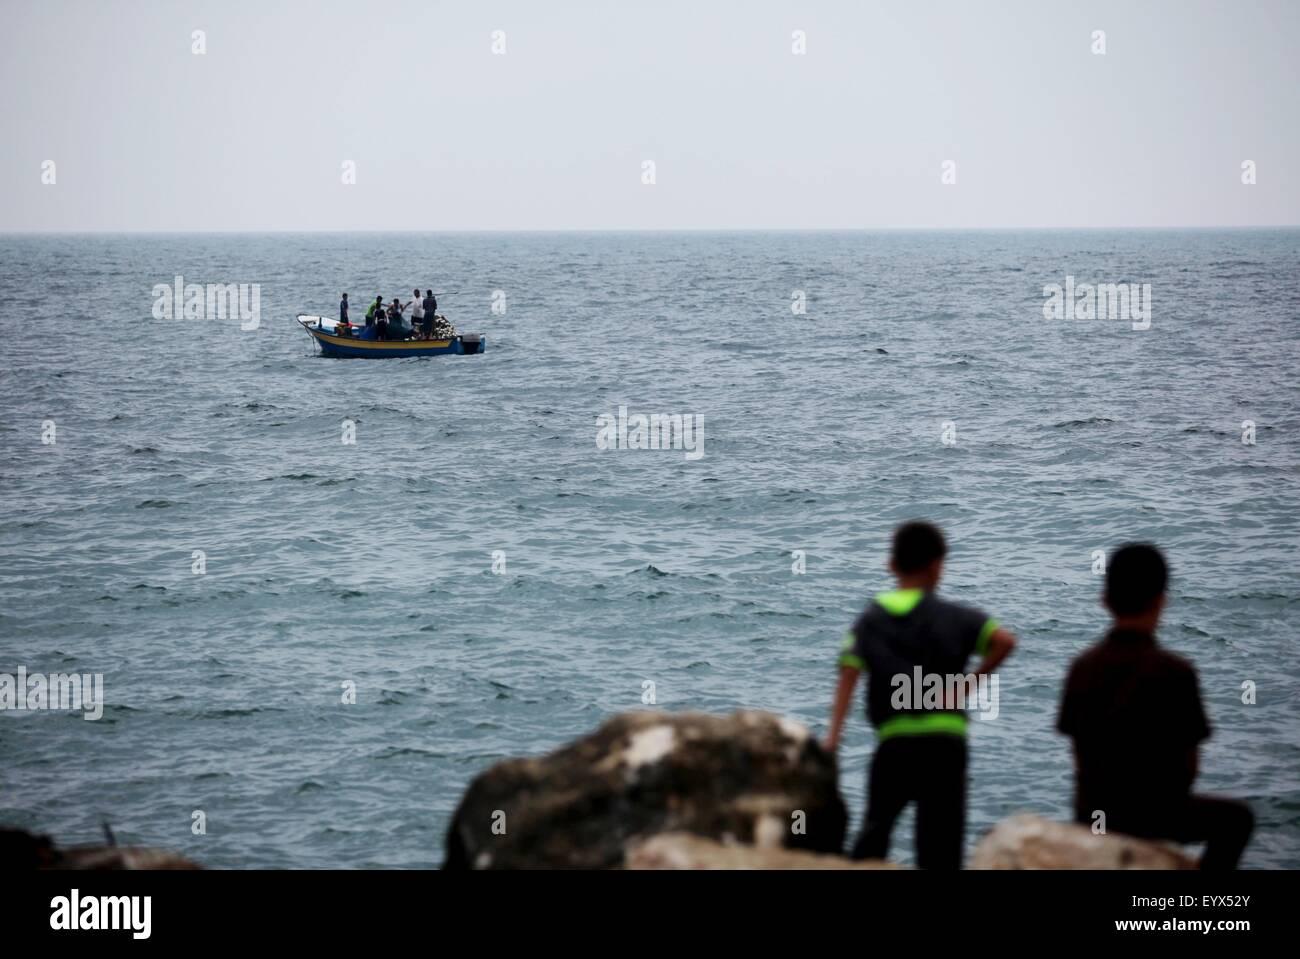 Gaza City, Gaza Strip, Palestinian Territory. 4th Aug, 2015. Palestinians enjoy the beach of the Mediterranean Sea - Stock Image